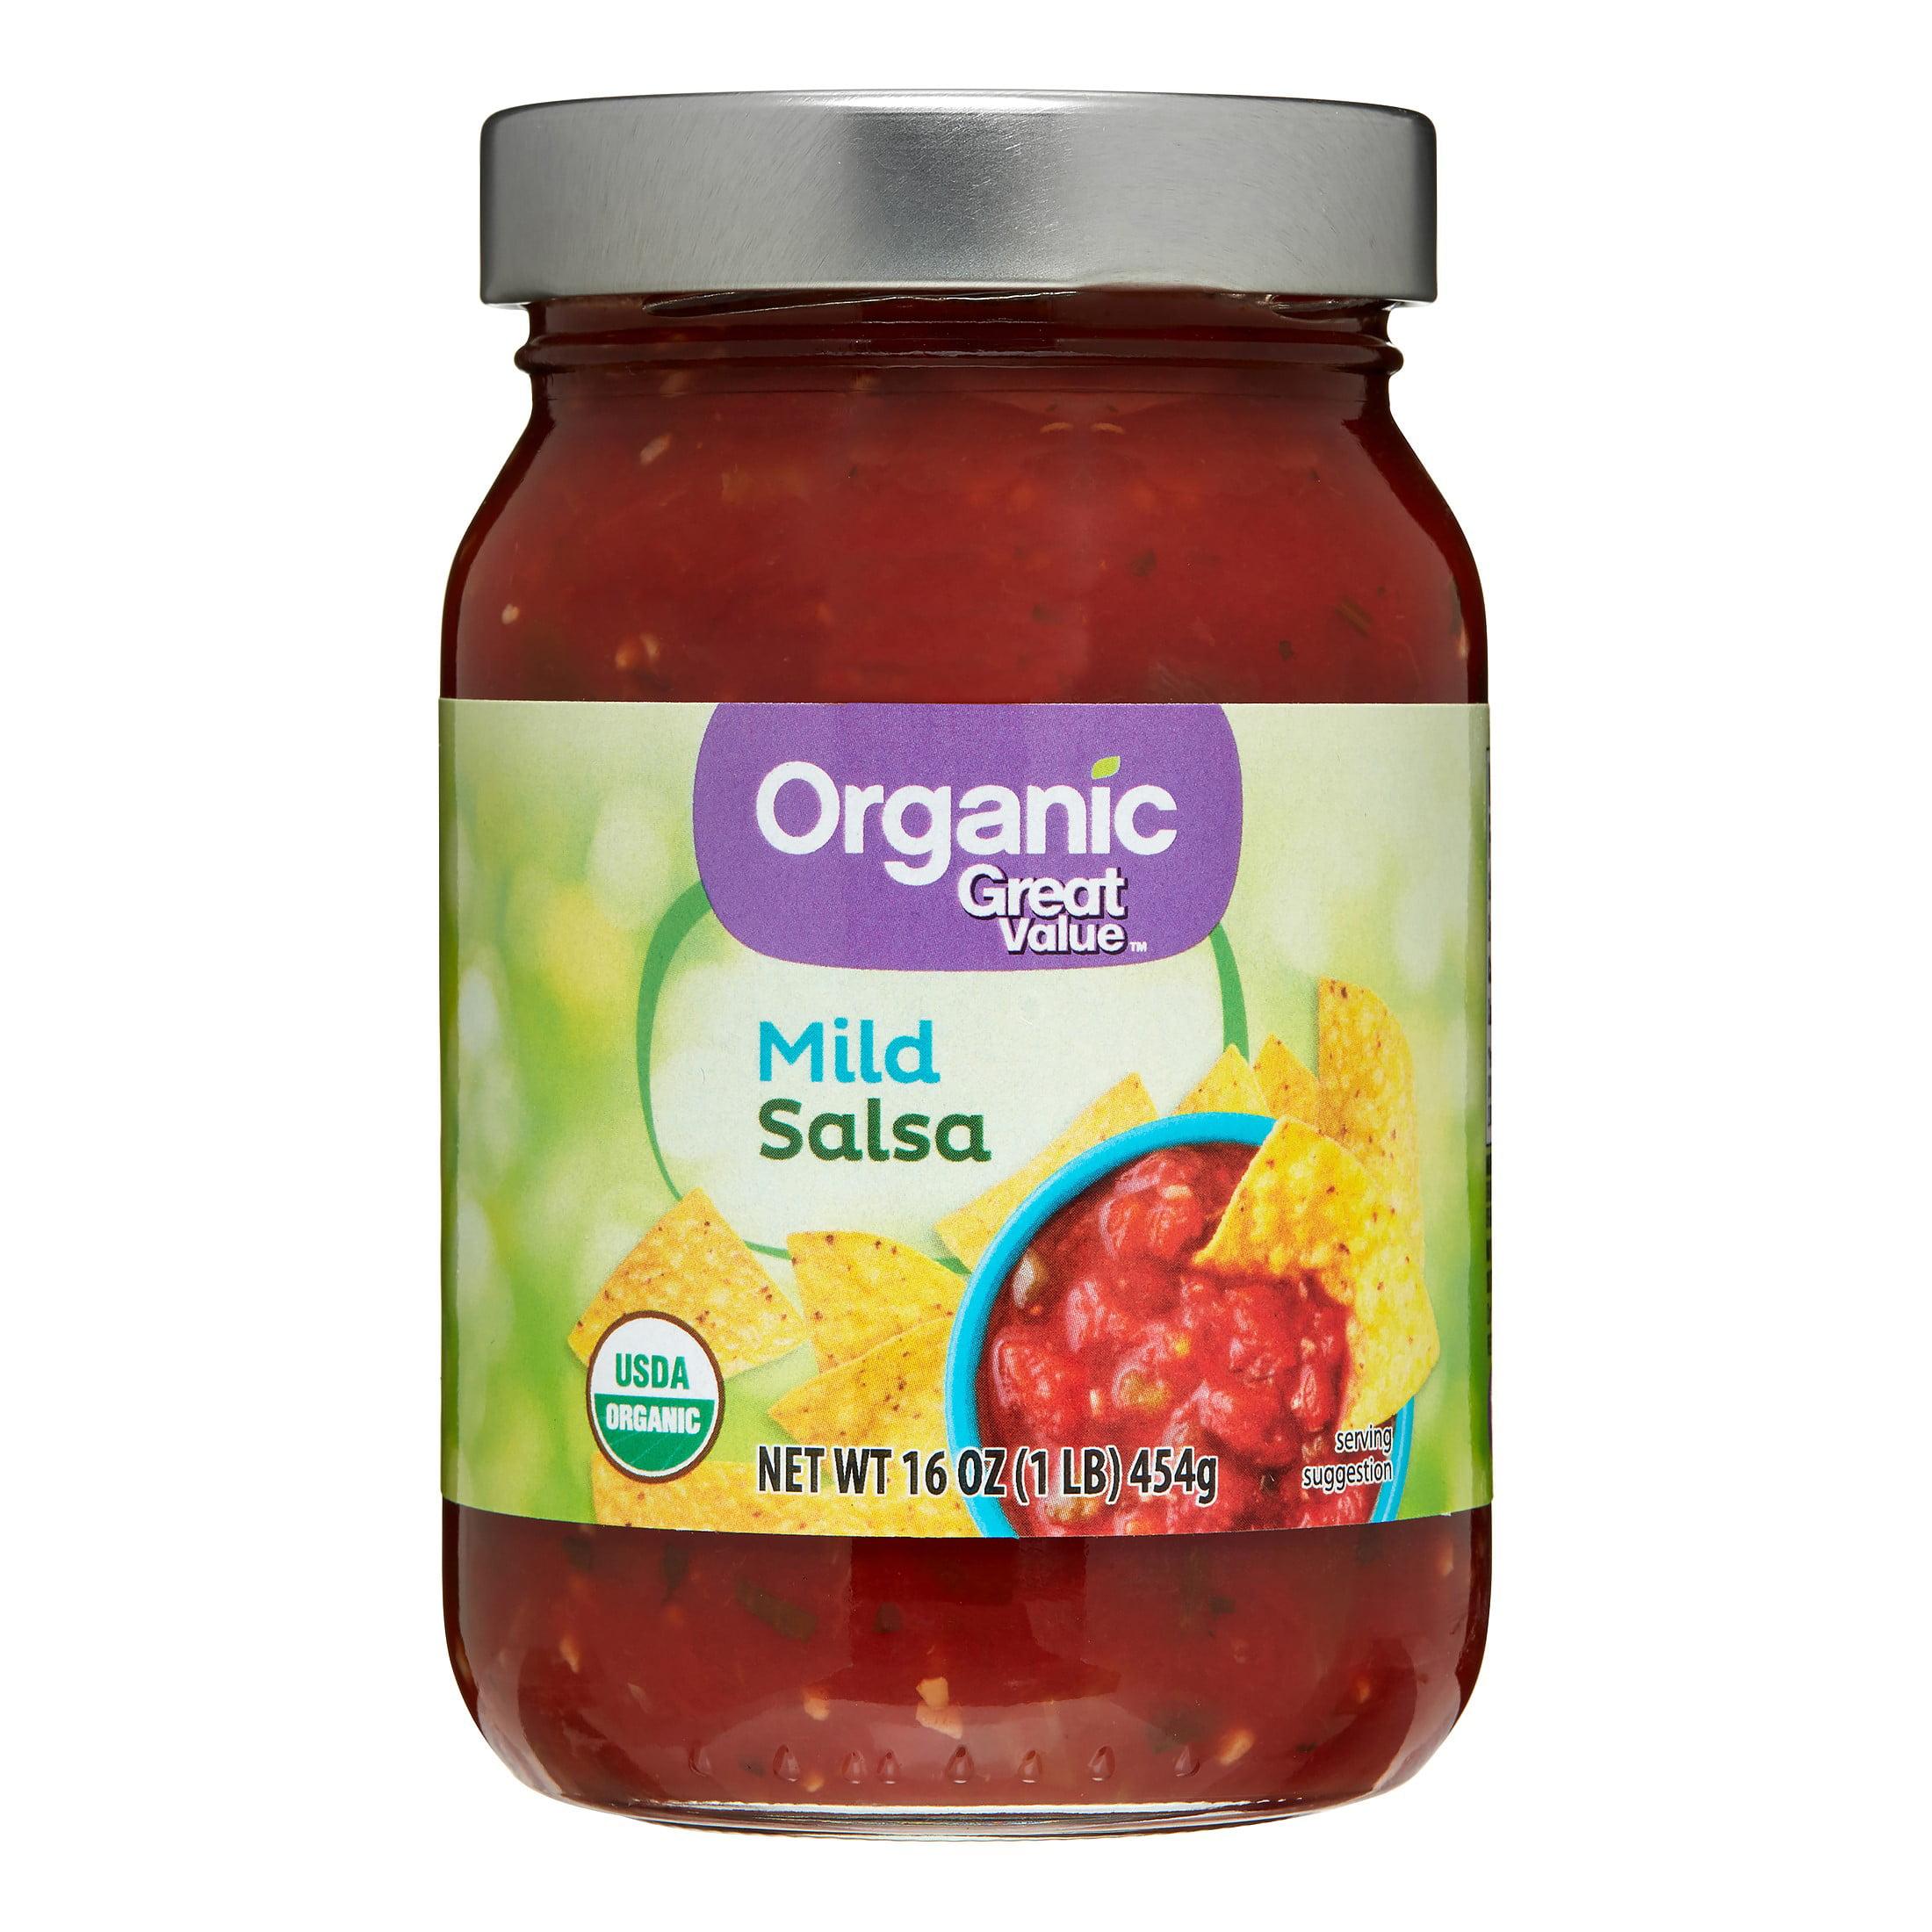 Great Value Organic Mild Salsa, 16 oz